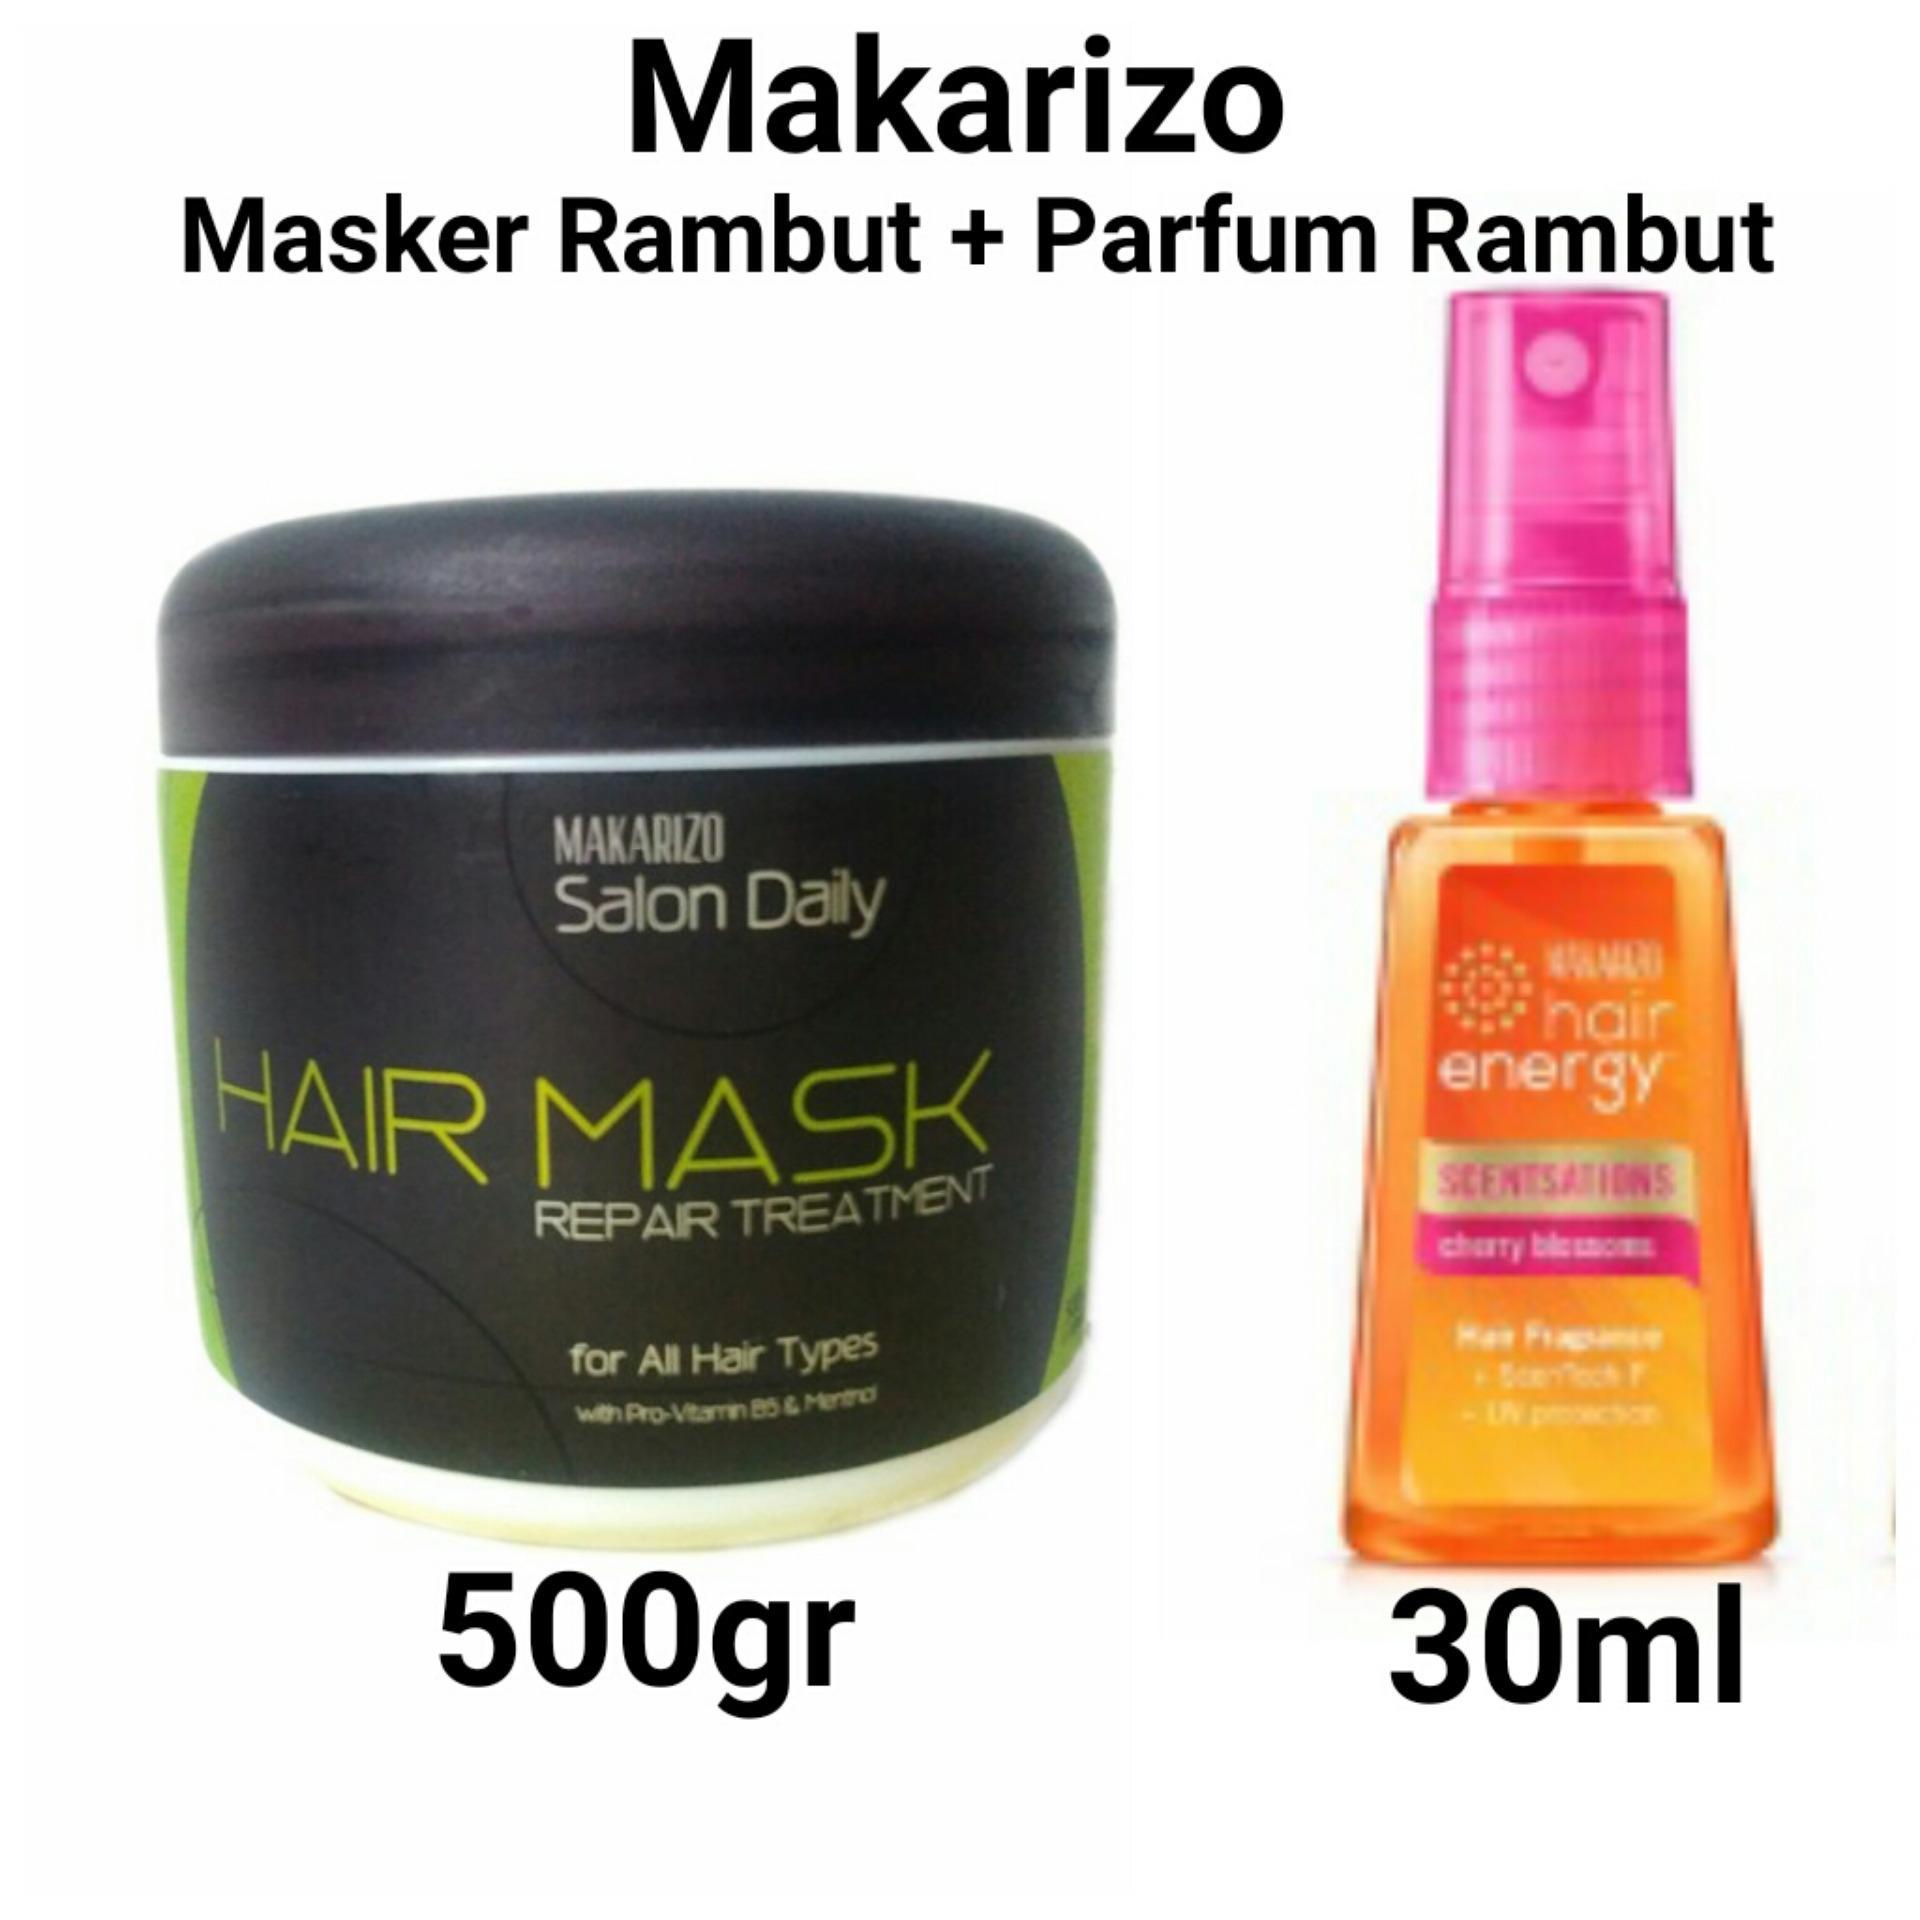 Best Price Makarizo Salon Daily Masker Rambut 500gr Parfum Rambut 30ml beli sekarang